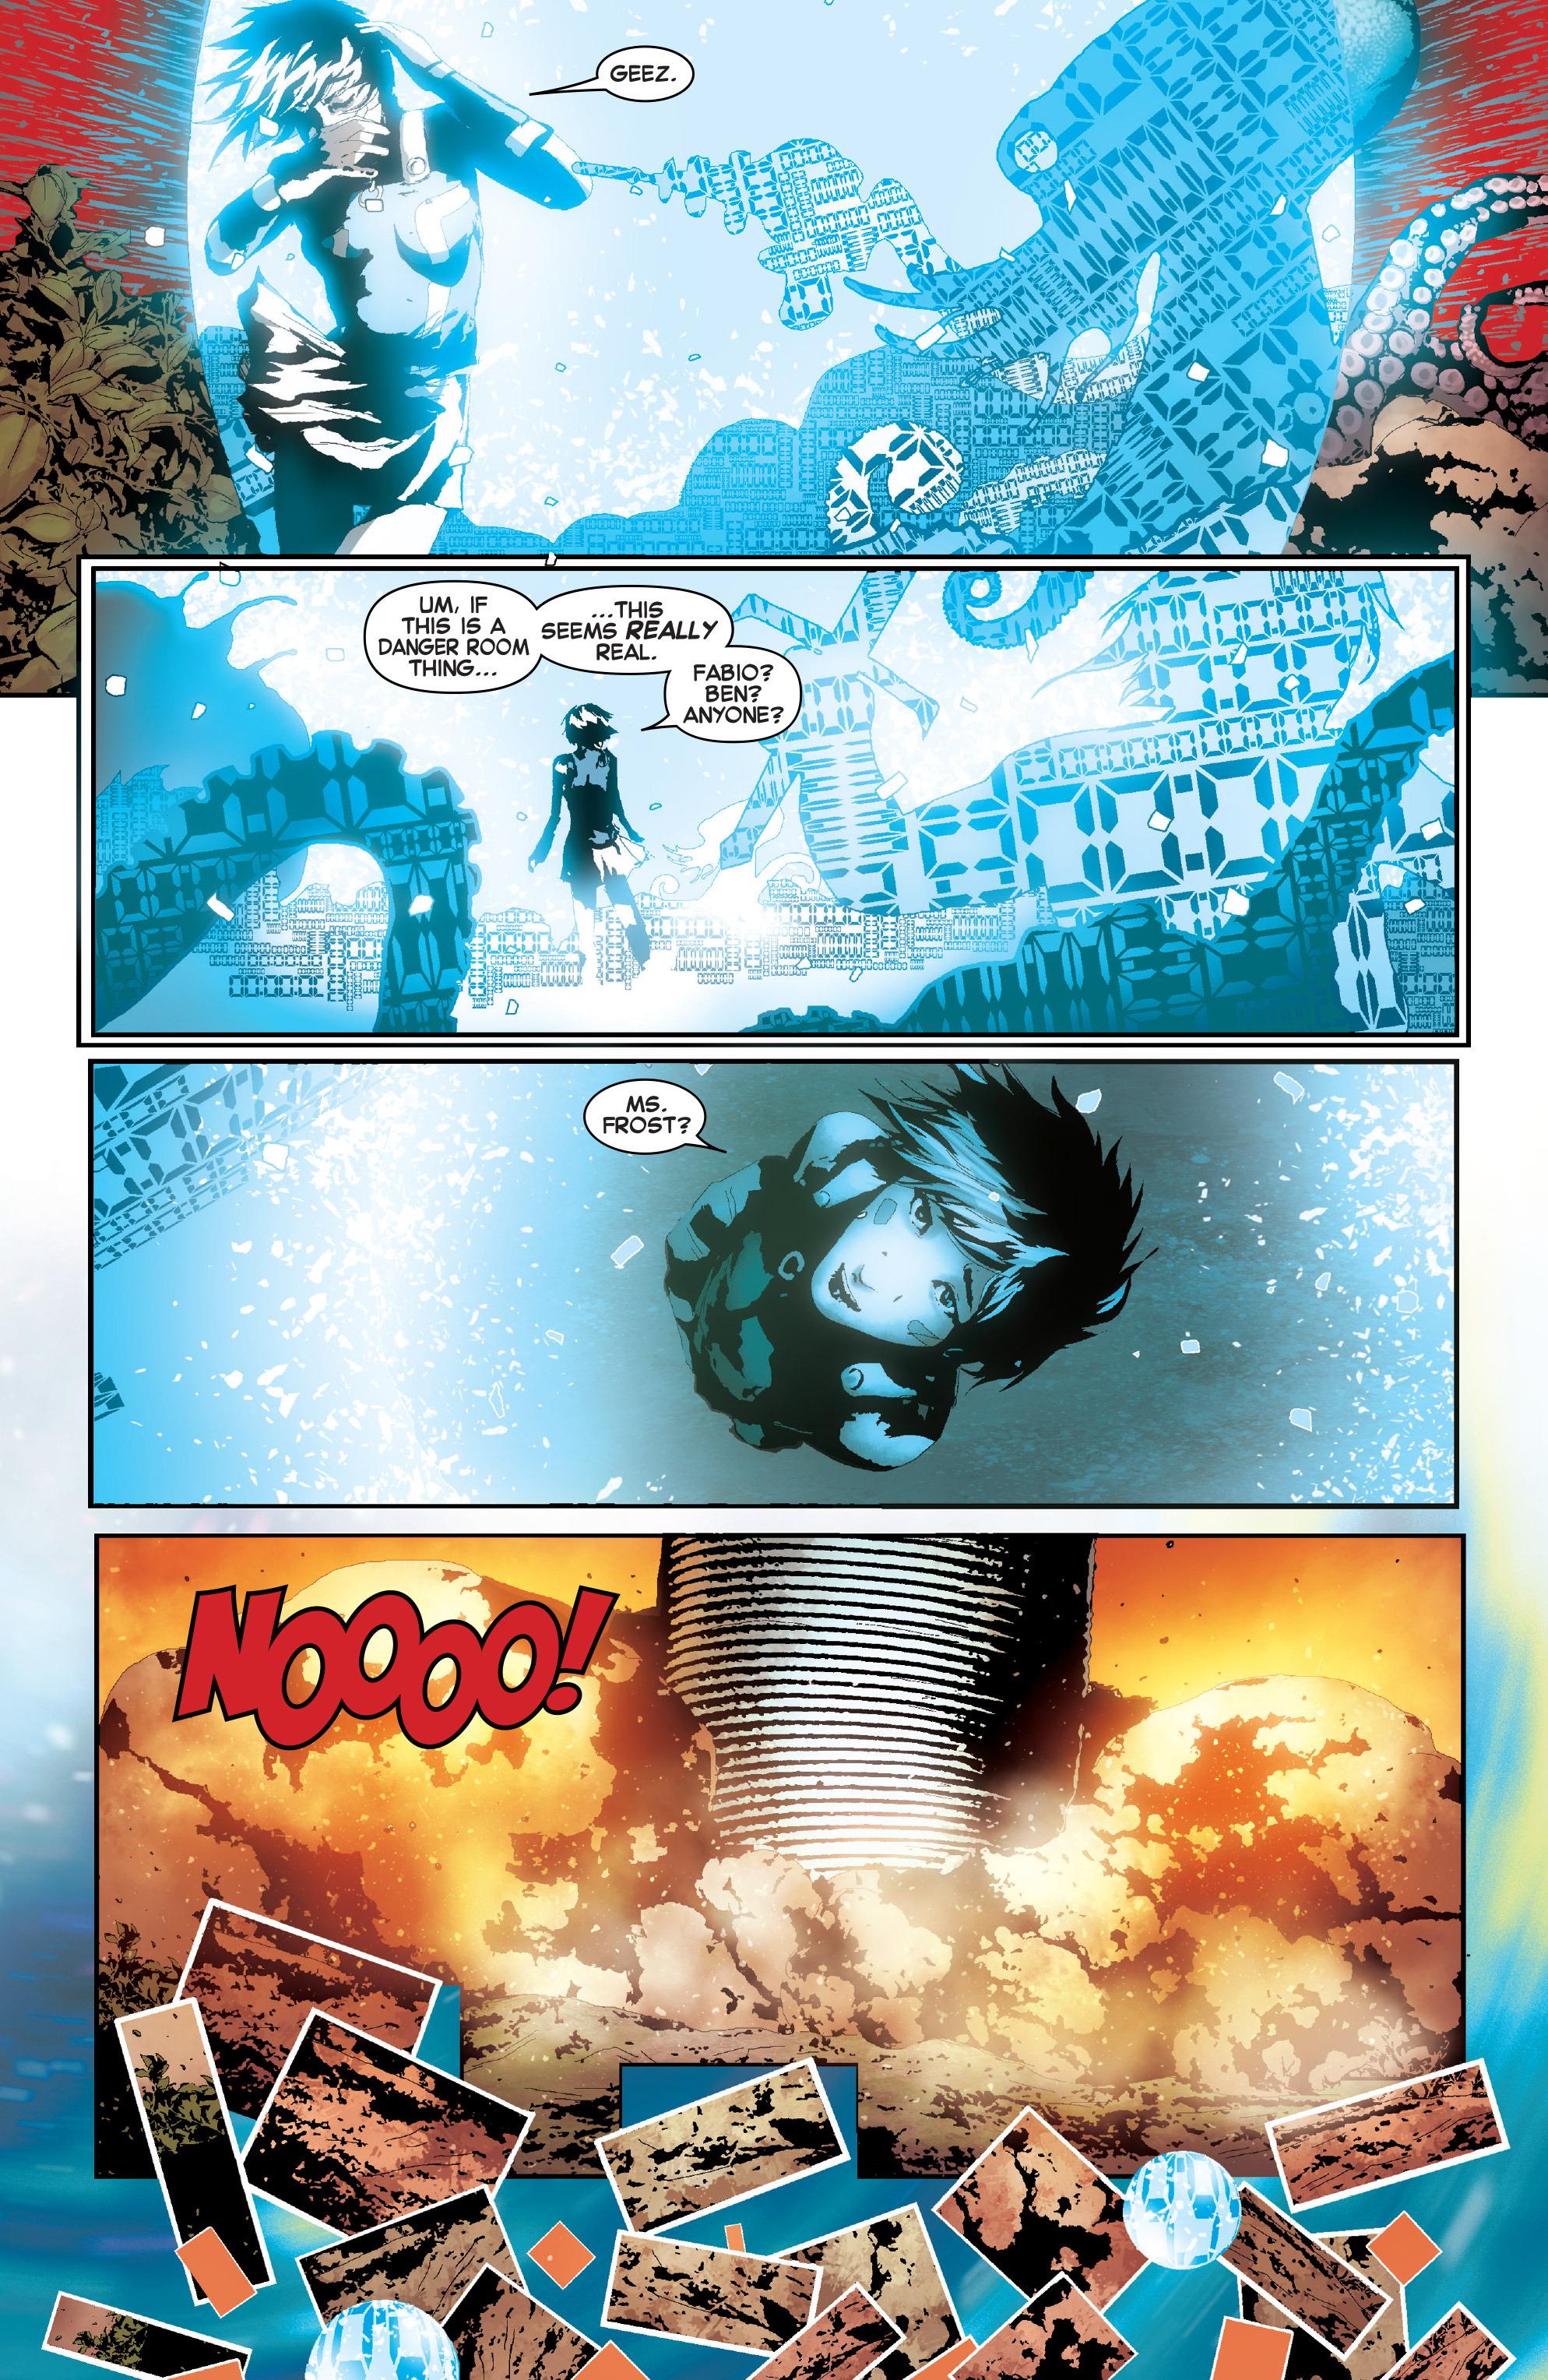 Read online Uncanny X-Men (2013) comic -  Issue # Annual 1 - 7